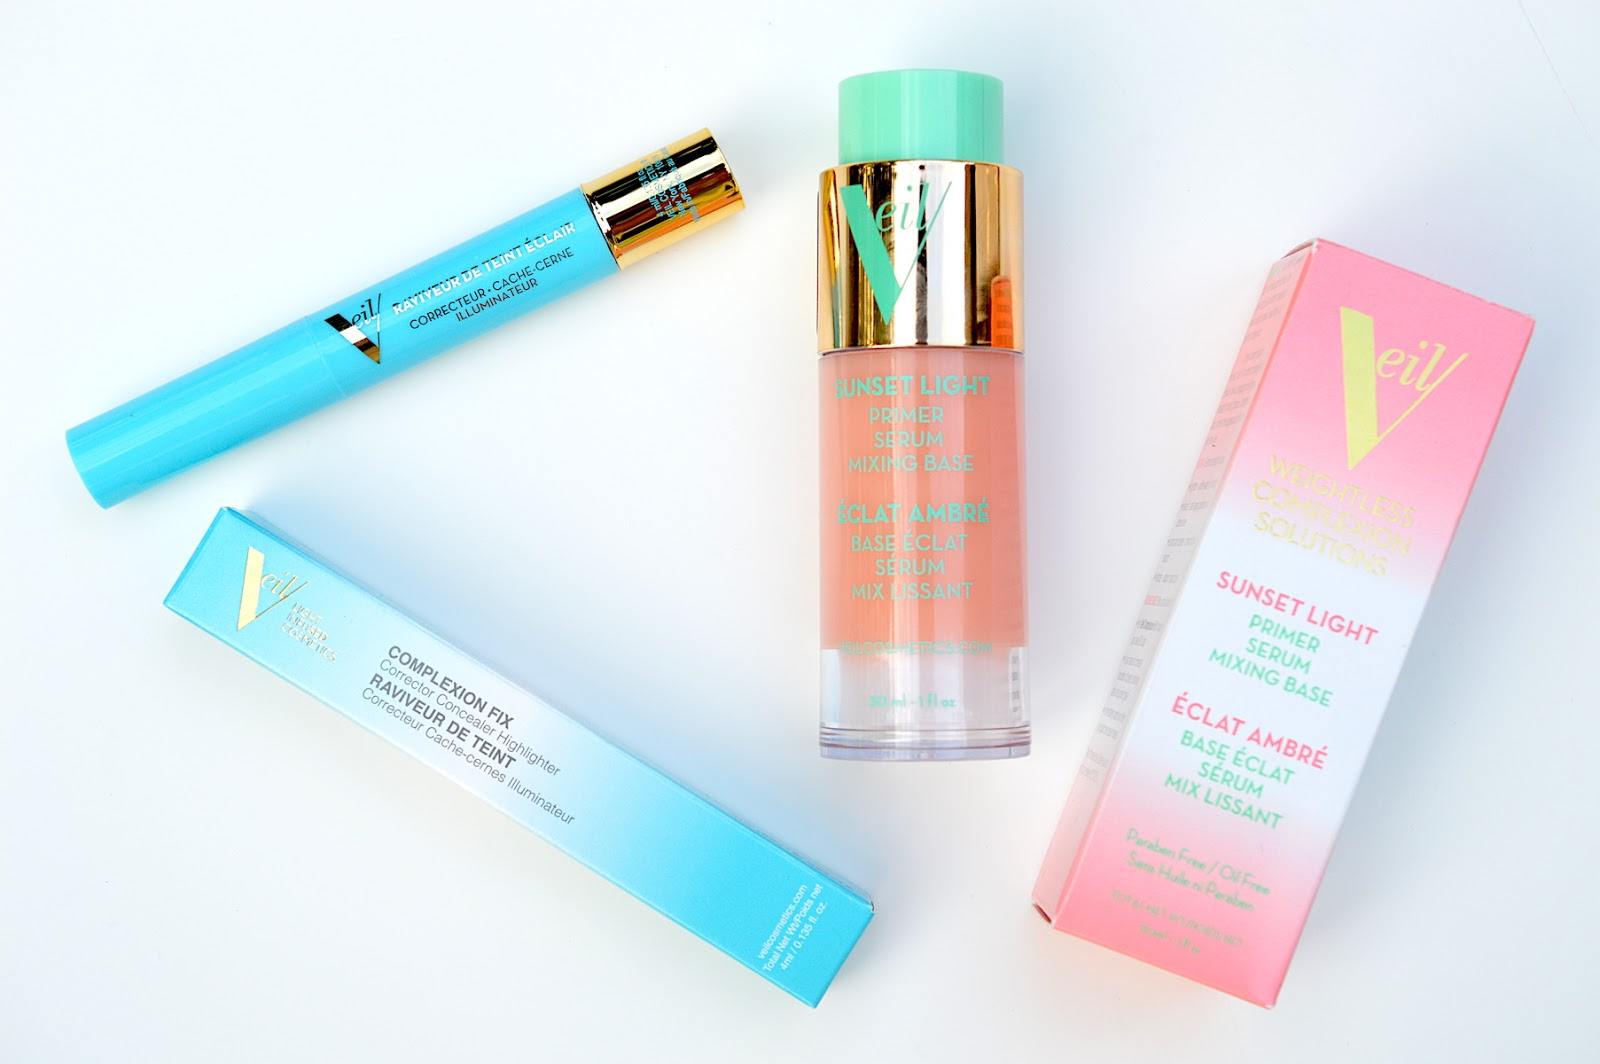 Veil Cosmetics